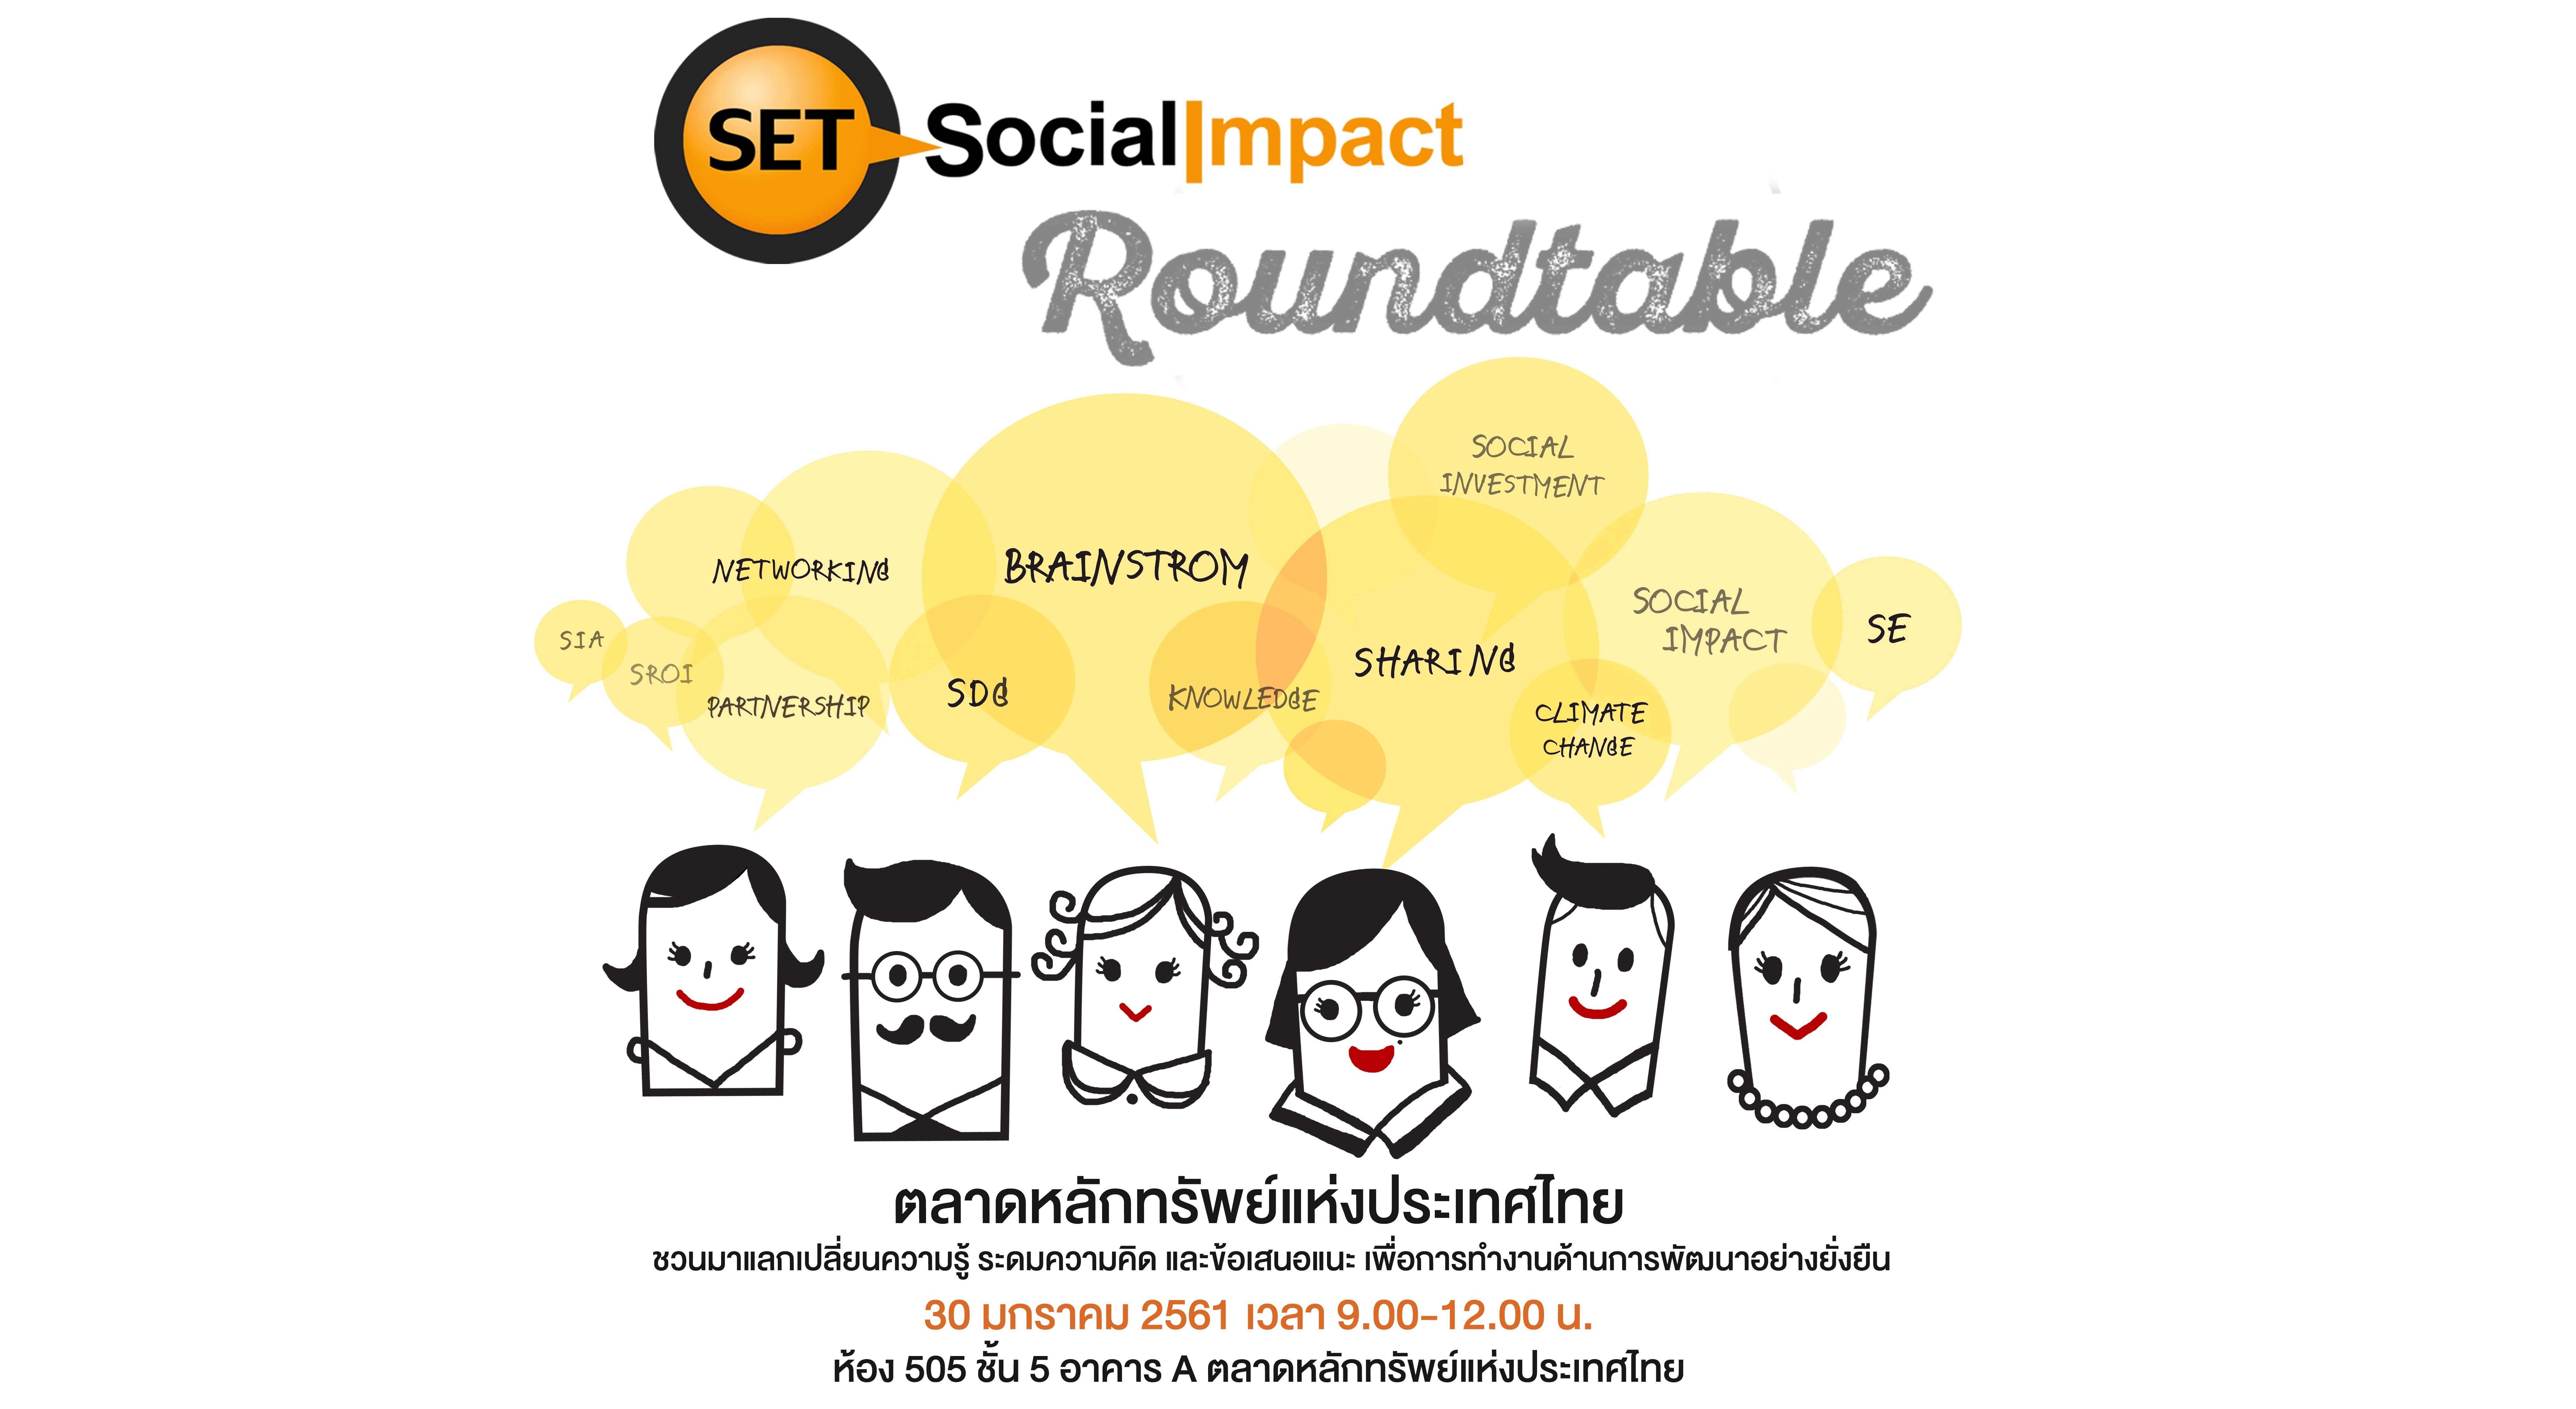 SET Socialimpact Roundtable